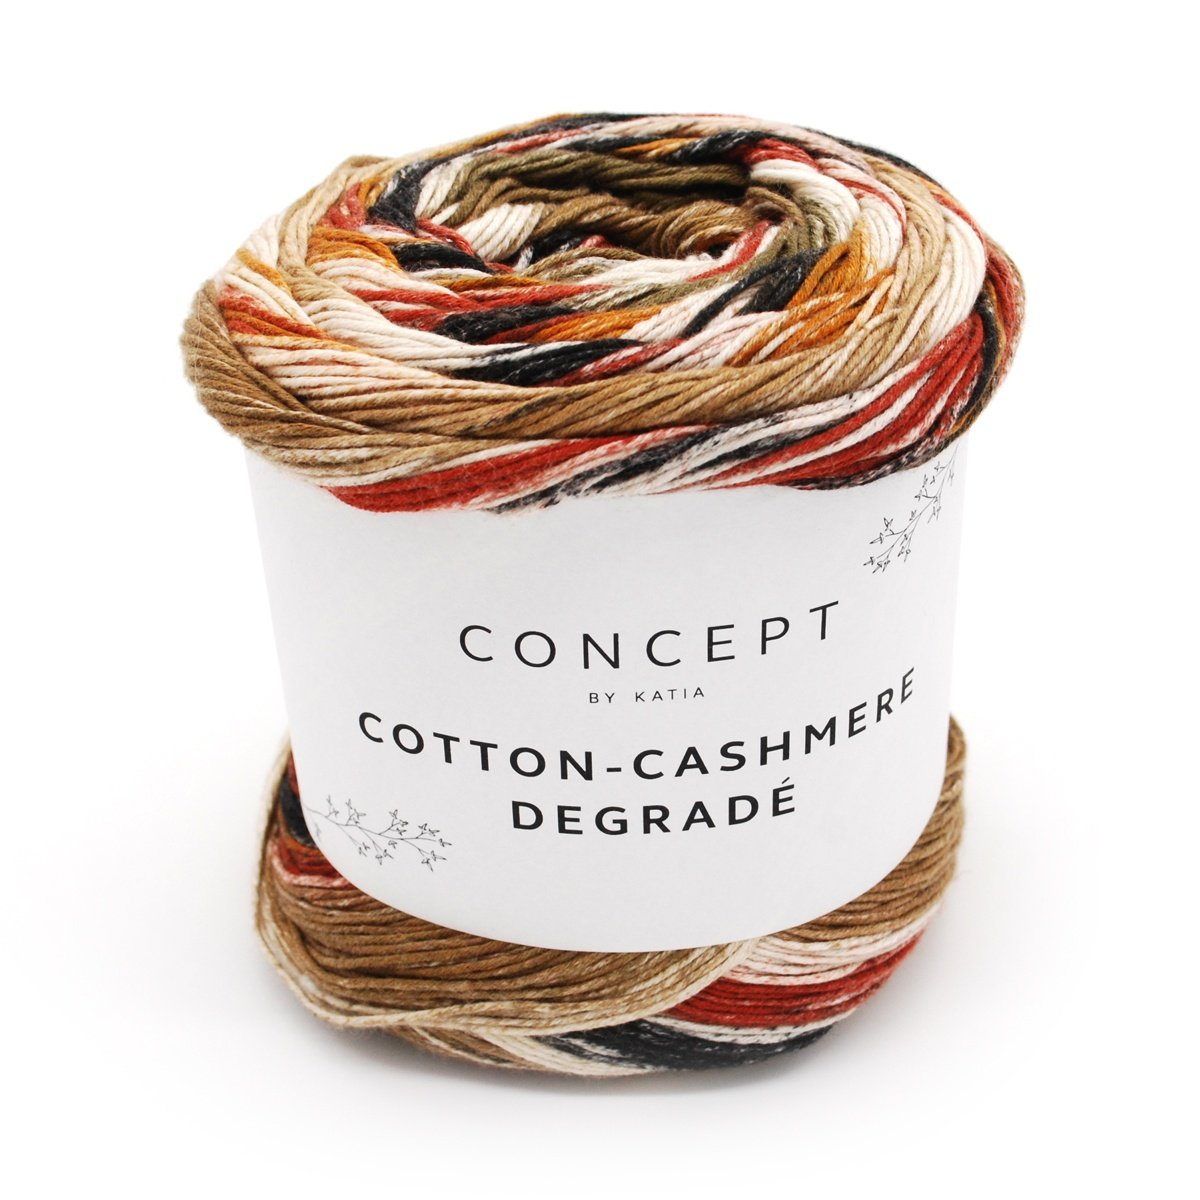 Cotton-Cashmere Degrade